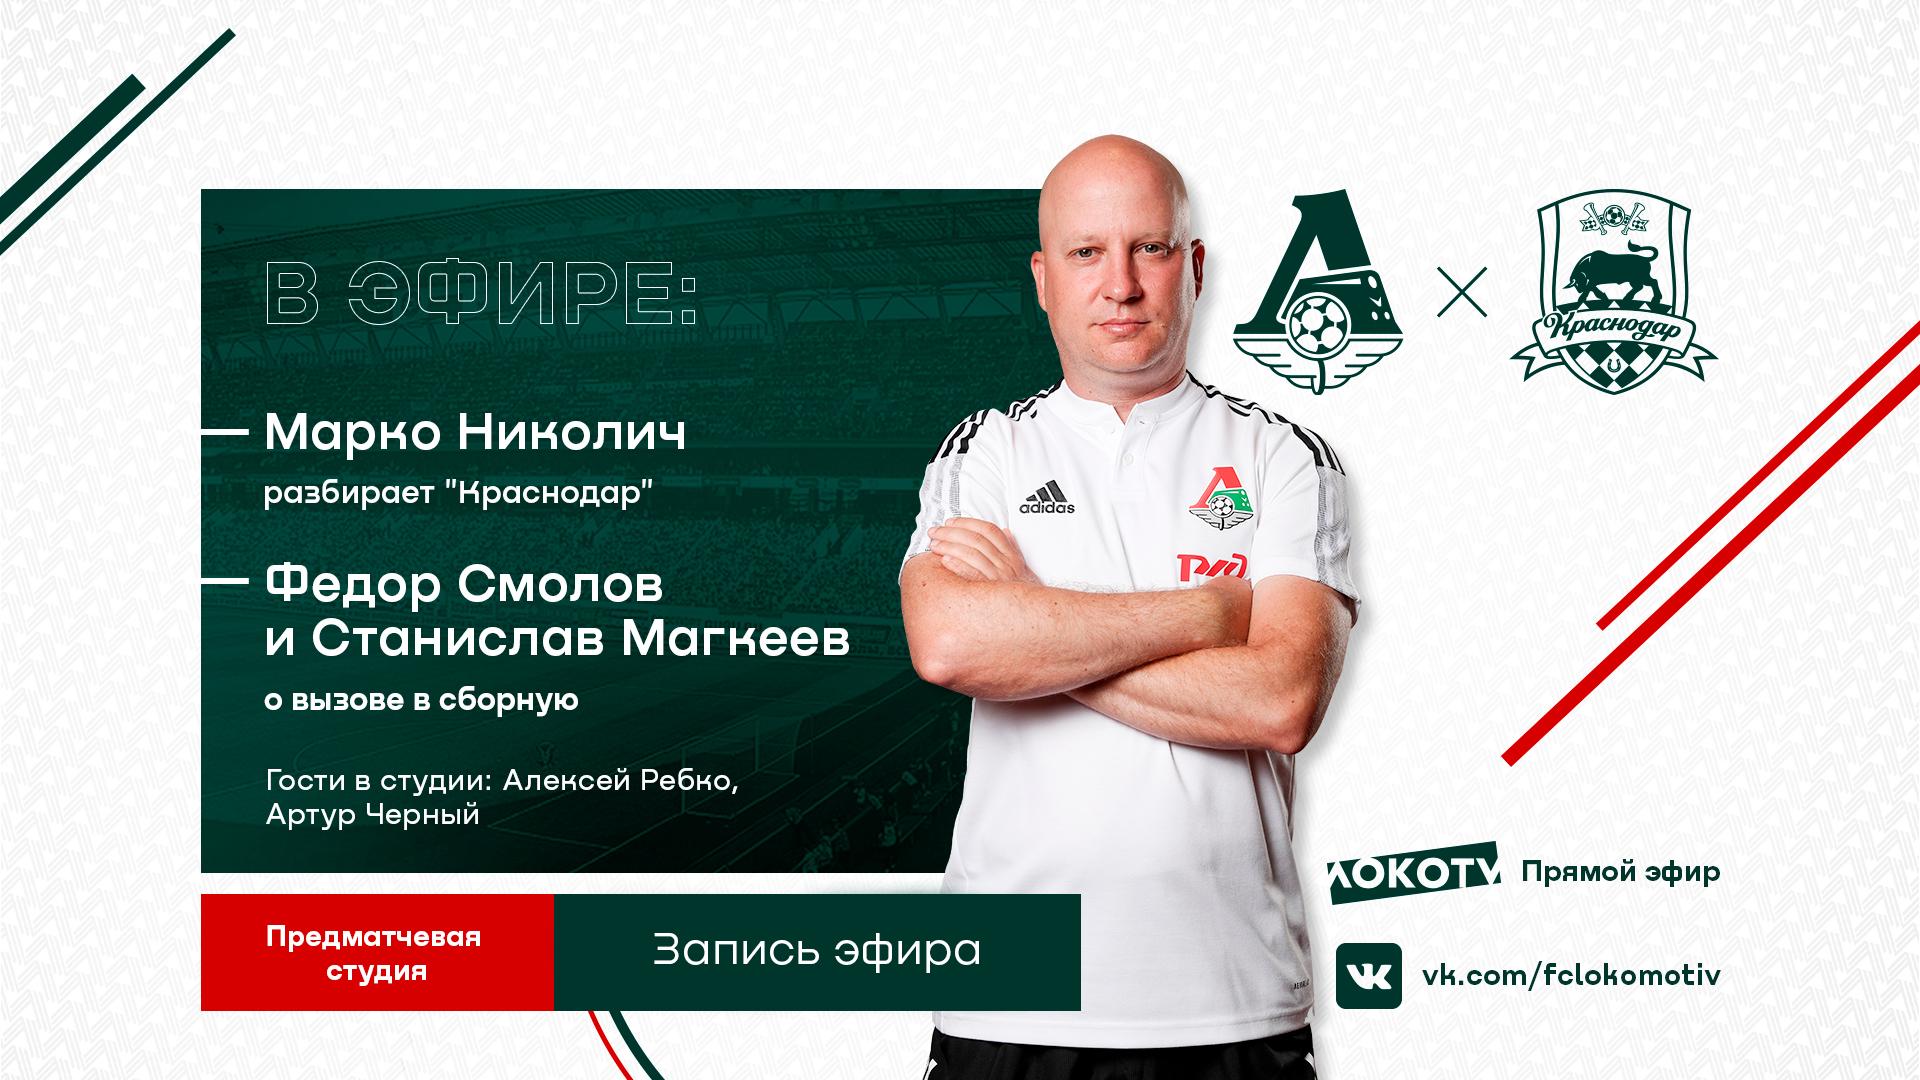 Студия LOKO TV на матче с «Краснодаром» // 22 августа 2021 г.